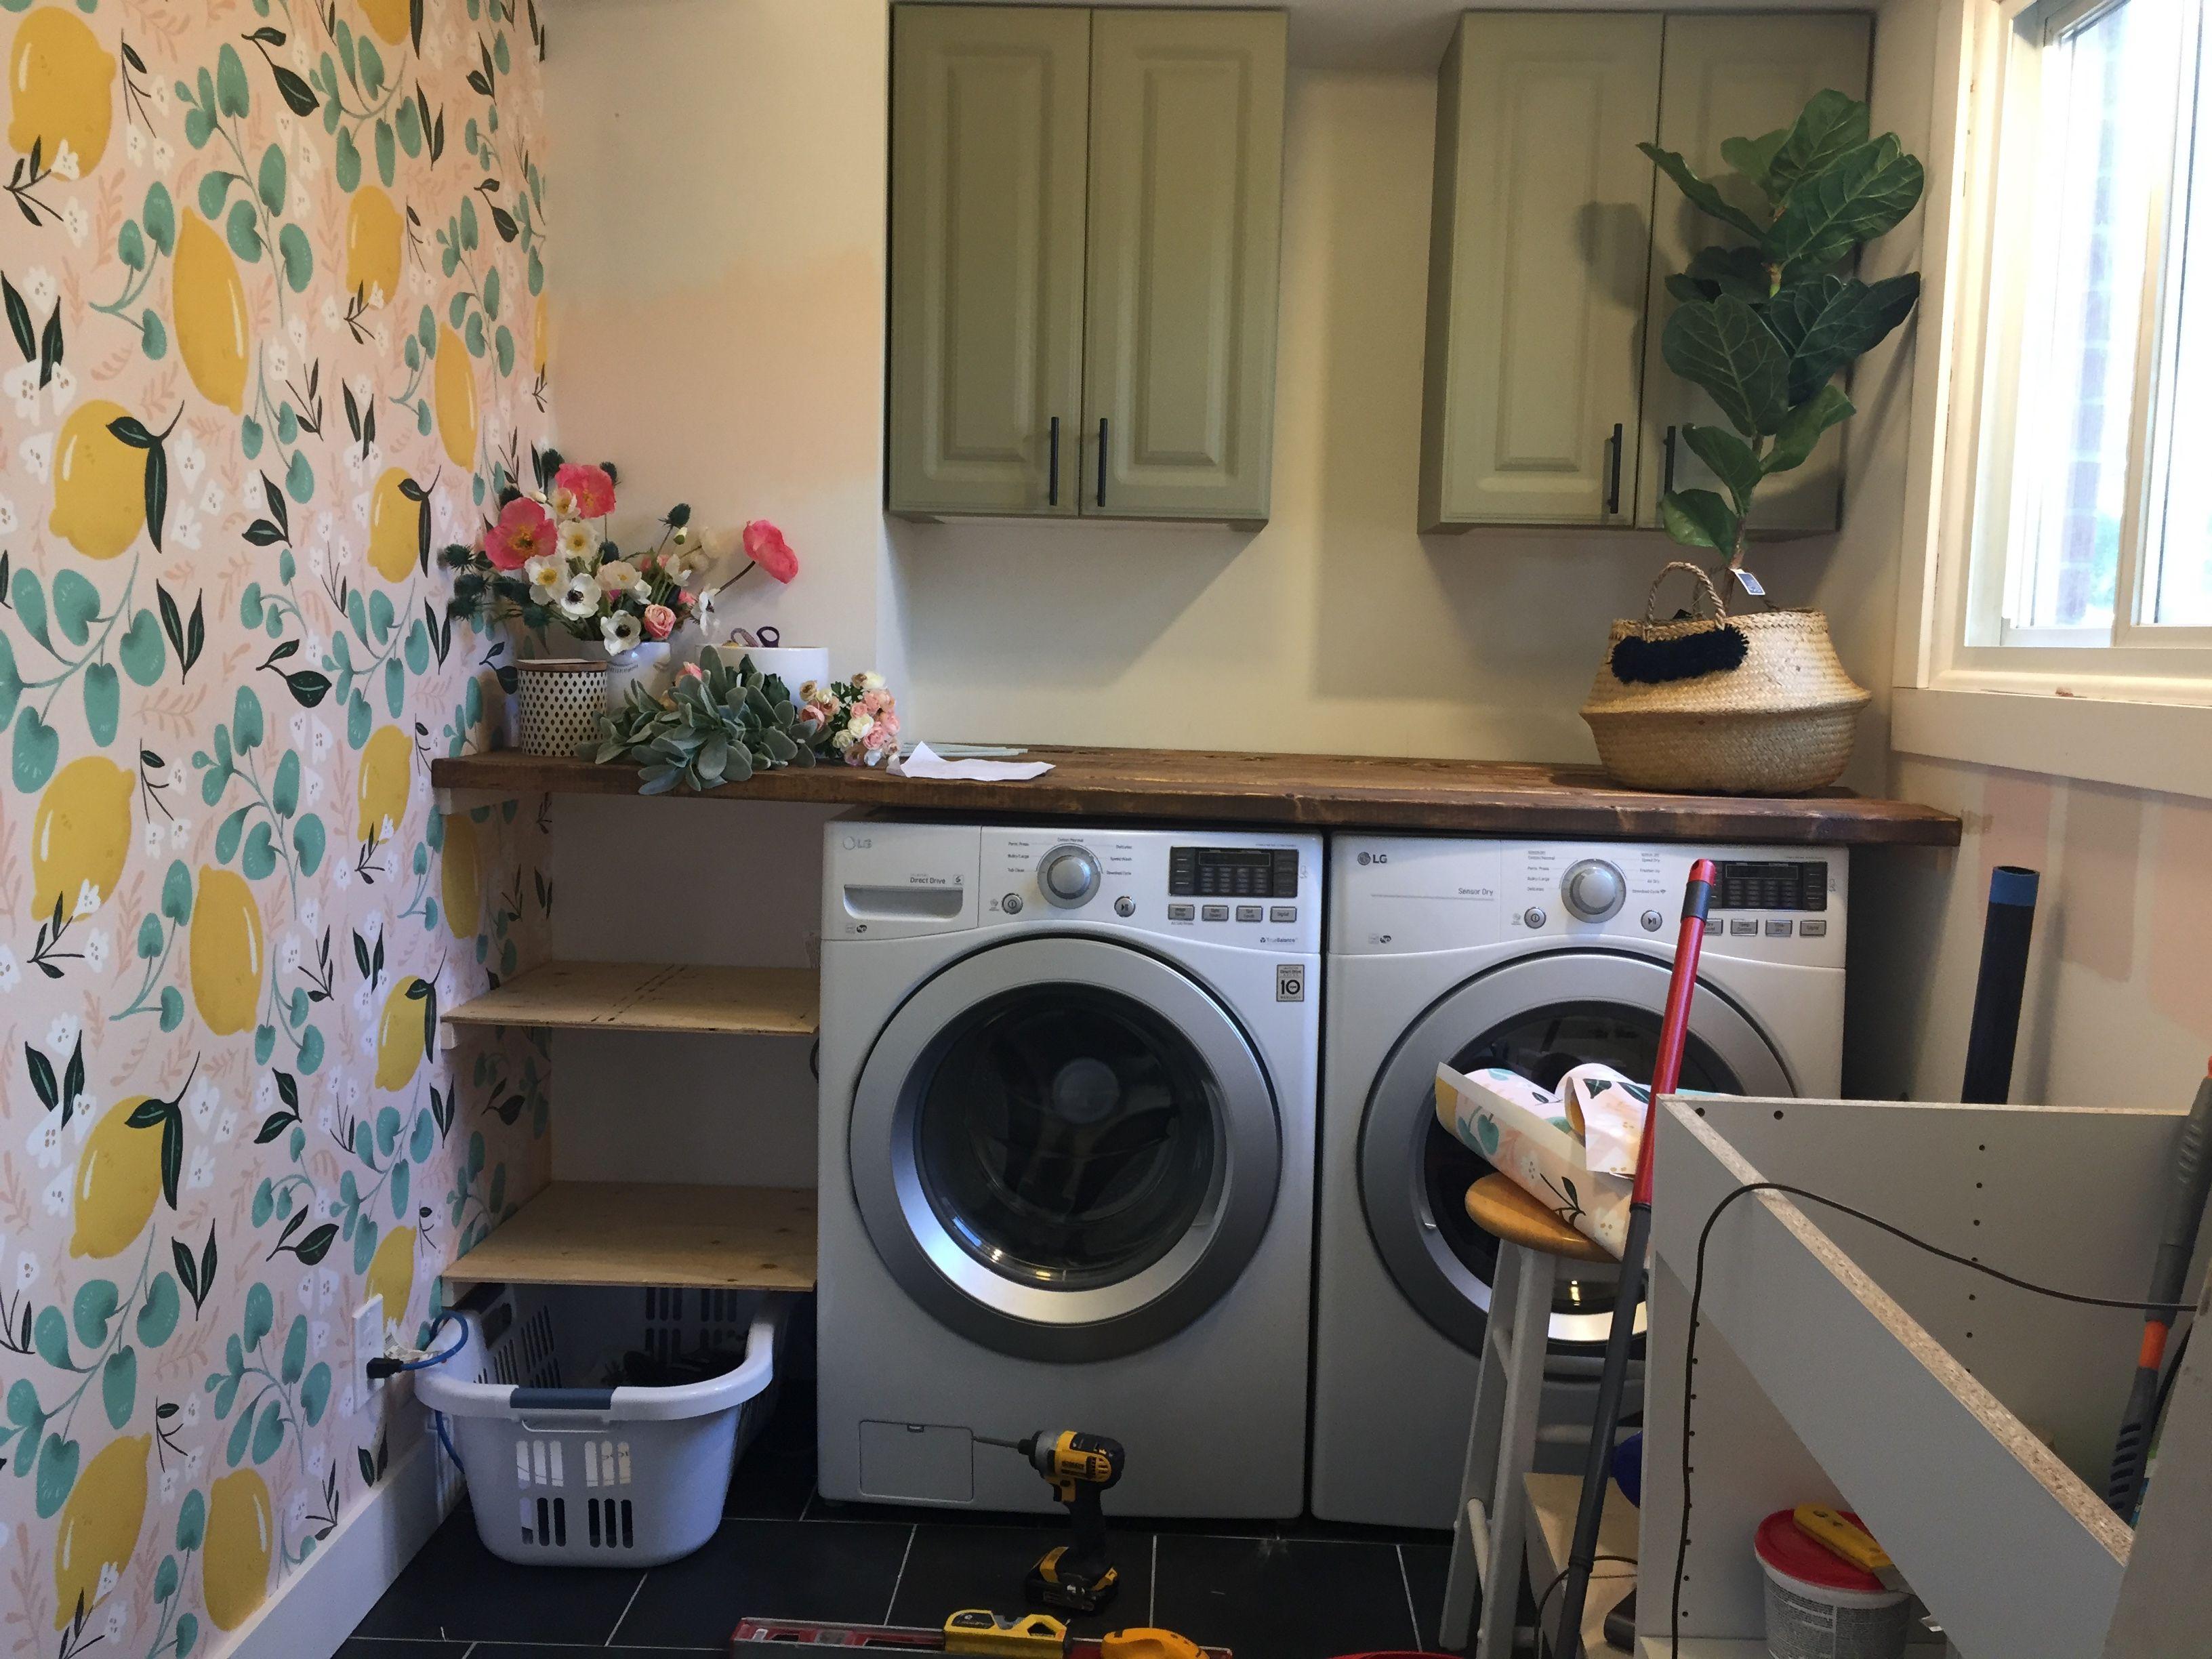 Diy Inexpensive Wood Countertop Wood Countertops Laundry Room